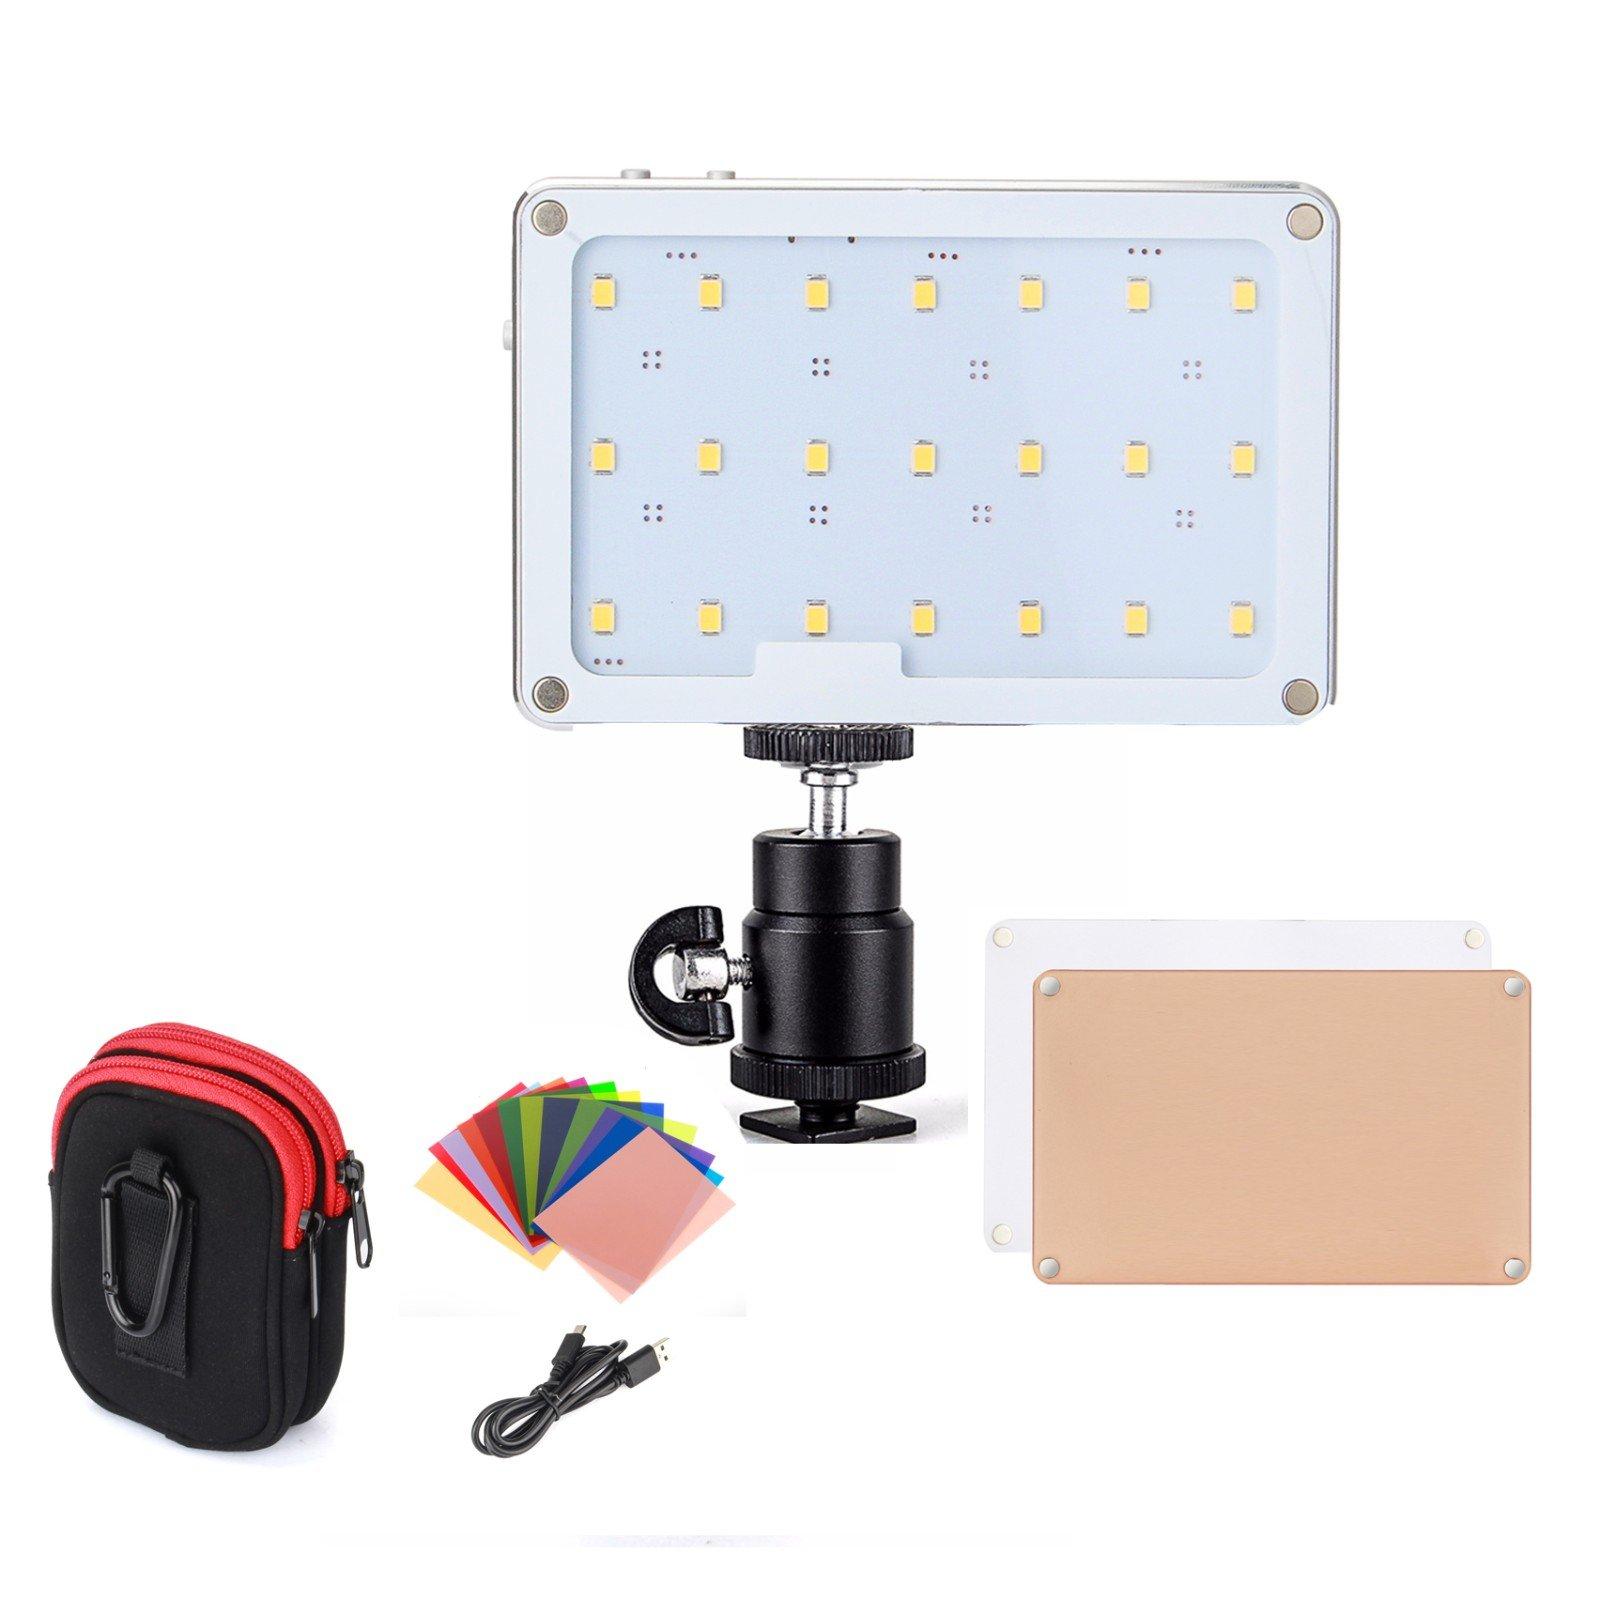 LED Video Light, SOKANI X21 Pocket-Sized Daylight OLED Screen Build-in 1600mAh Battery Lighting Video LED DSLR Sony, Nikon, Canon, iPhone, 21 Bulbs Great Video Vlogging Selfies